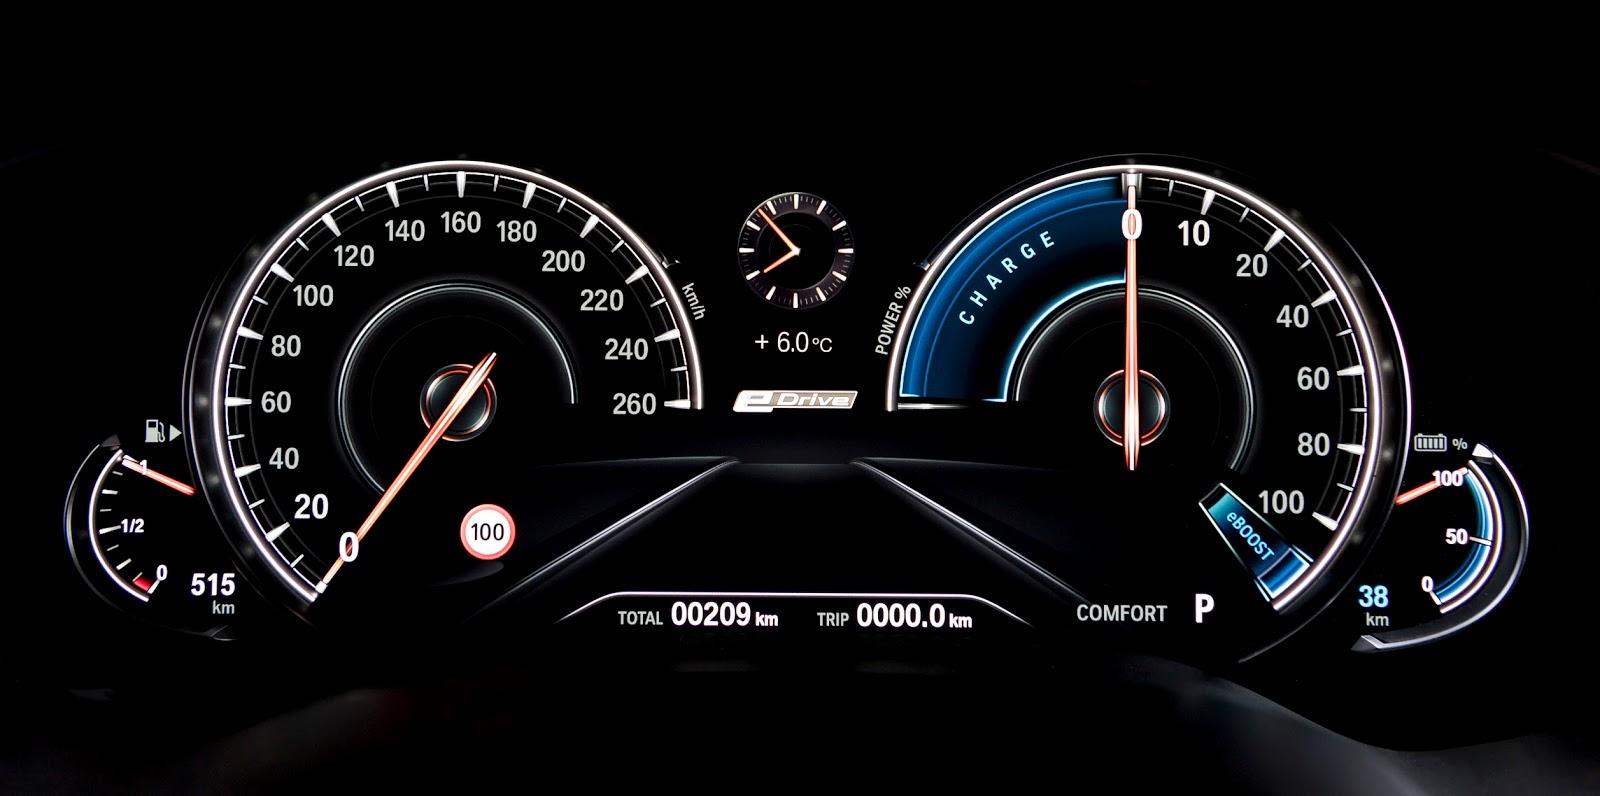 P90256379 highRes the new bmw 530e ipe Η BMW 530e iPerformance φέρνει την ηλεκτρική επανάσταση BMW, BMW 5, BMW 530e iPerformance, Electric cars, Hybrid, Λανσάρισμα